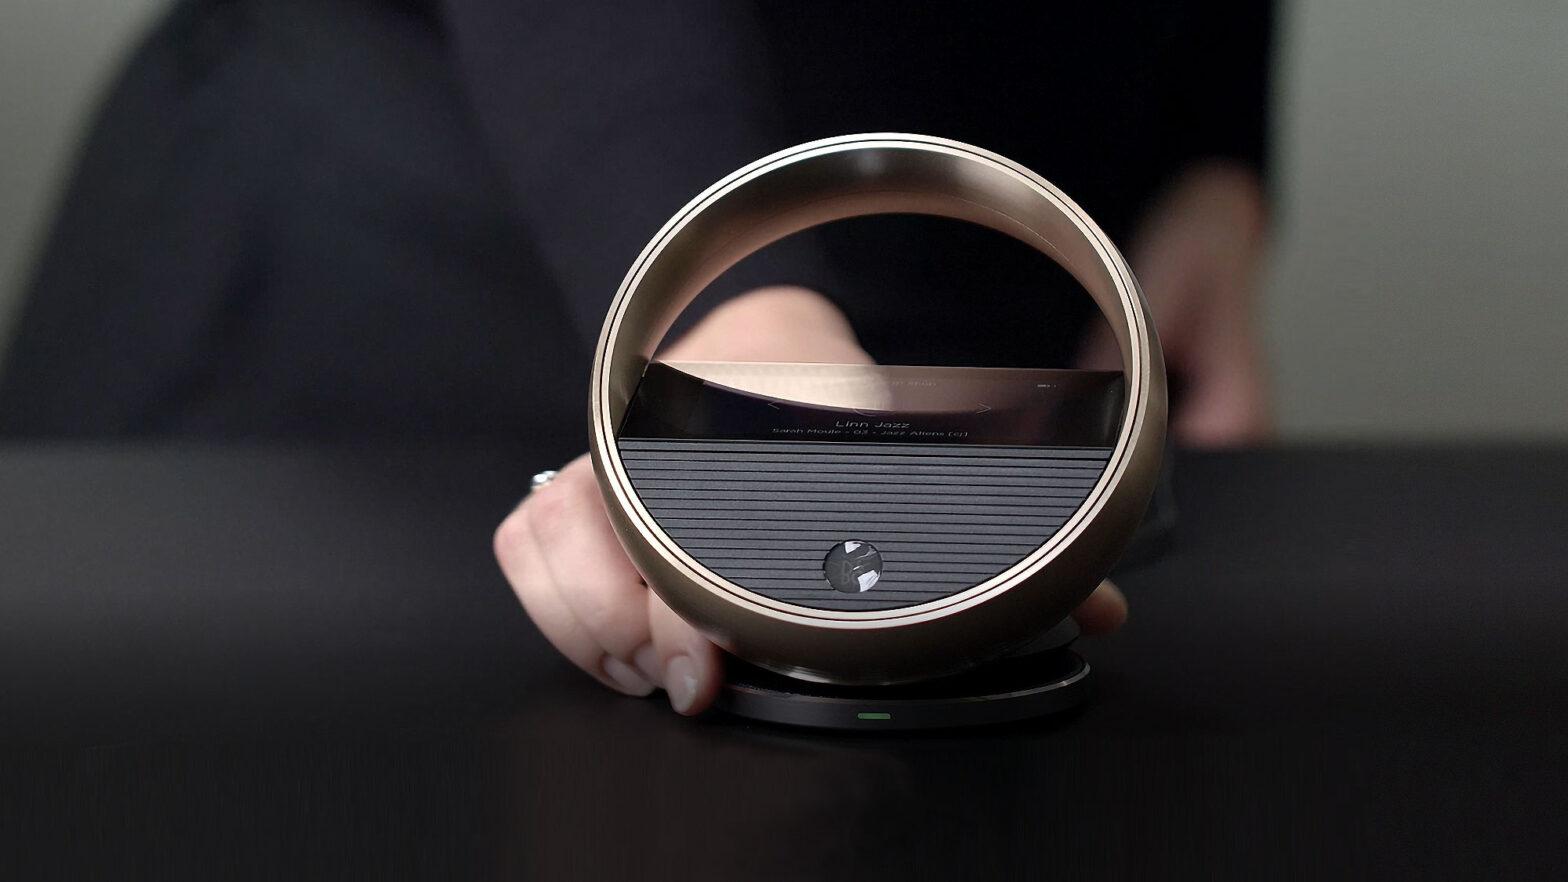 Bang & Olufsen Beoremote Halo Remote Control